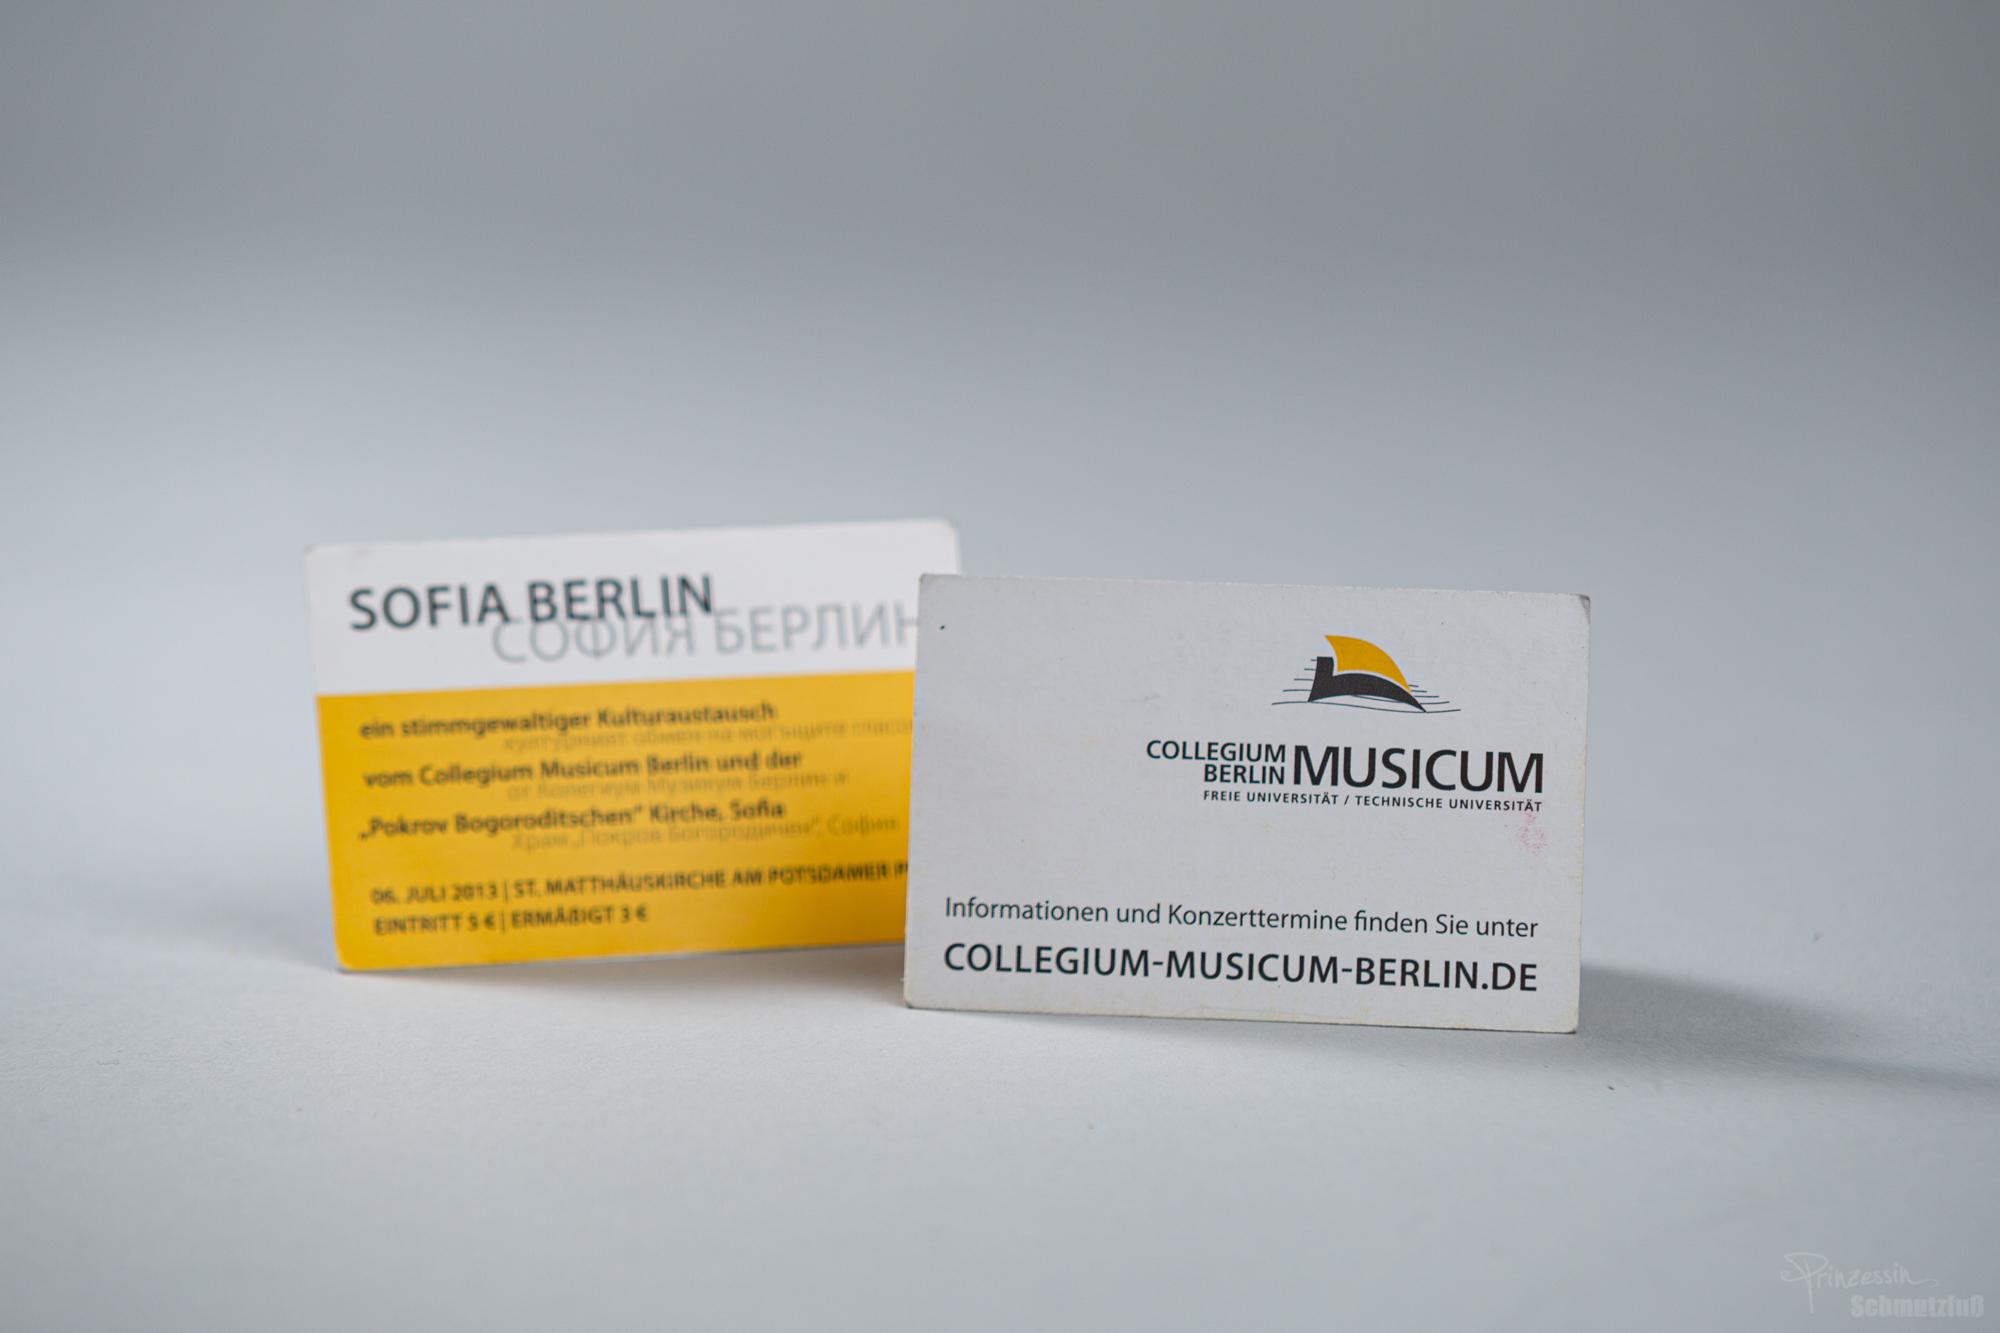 Layout Visitenkarte | Ankündigung zum Konzert | Collegium Musicum Berlin